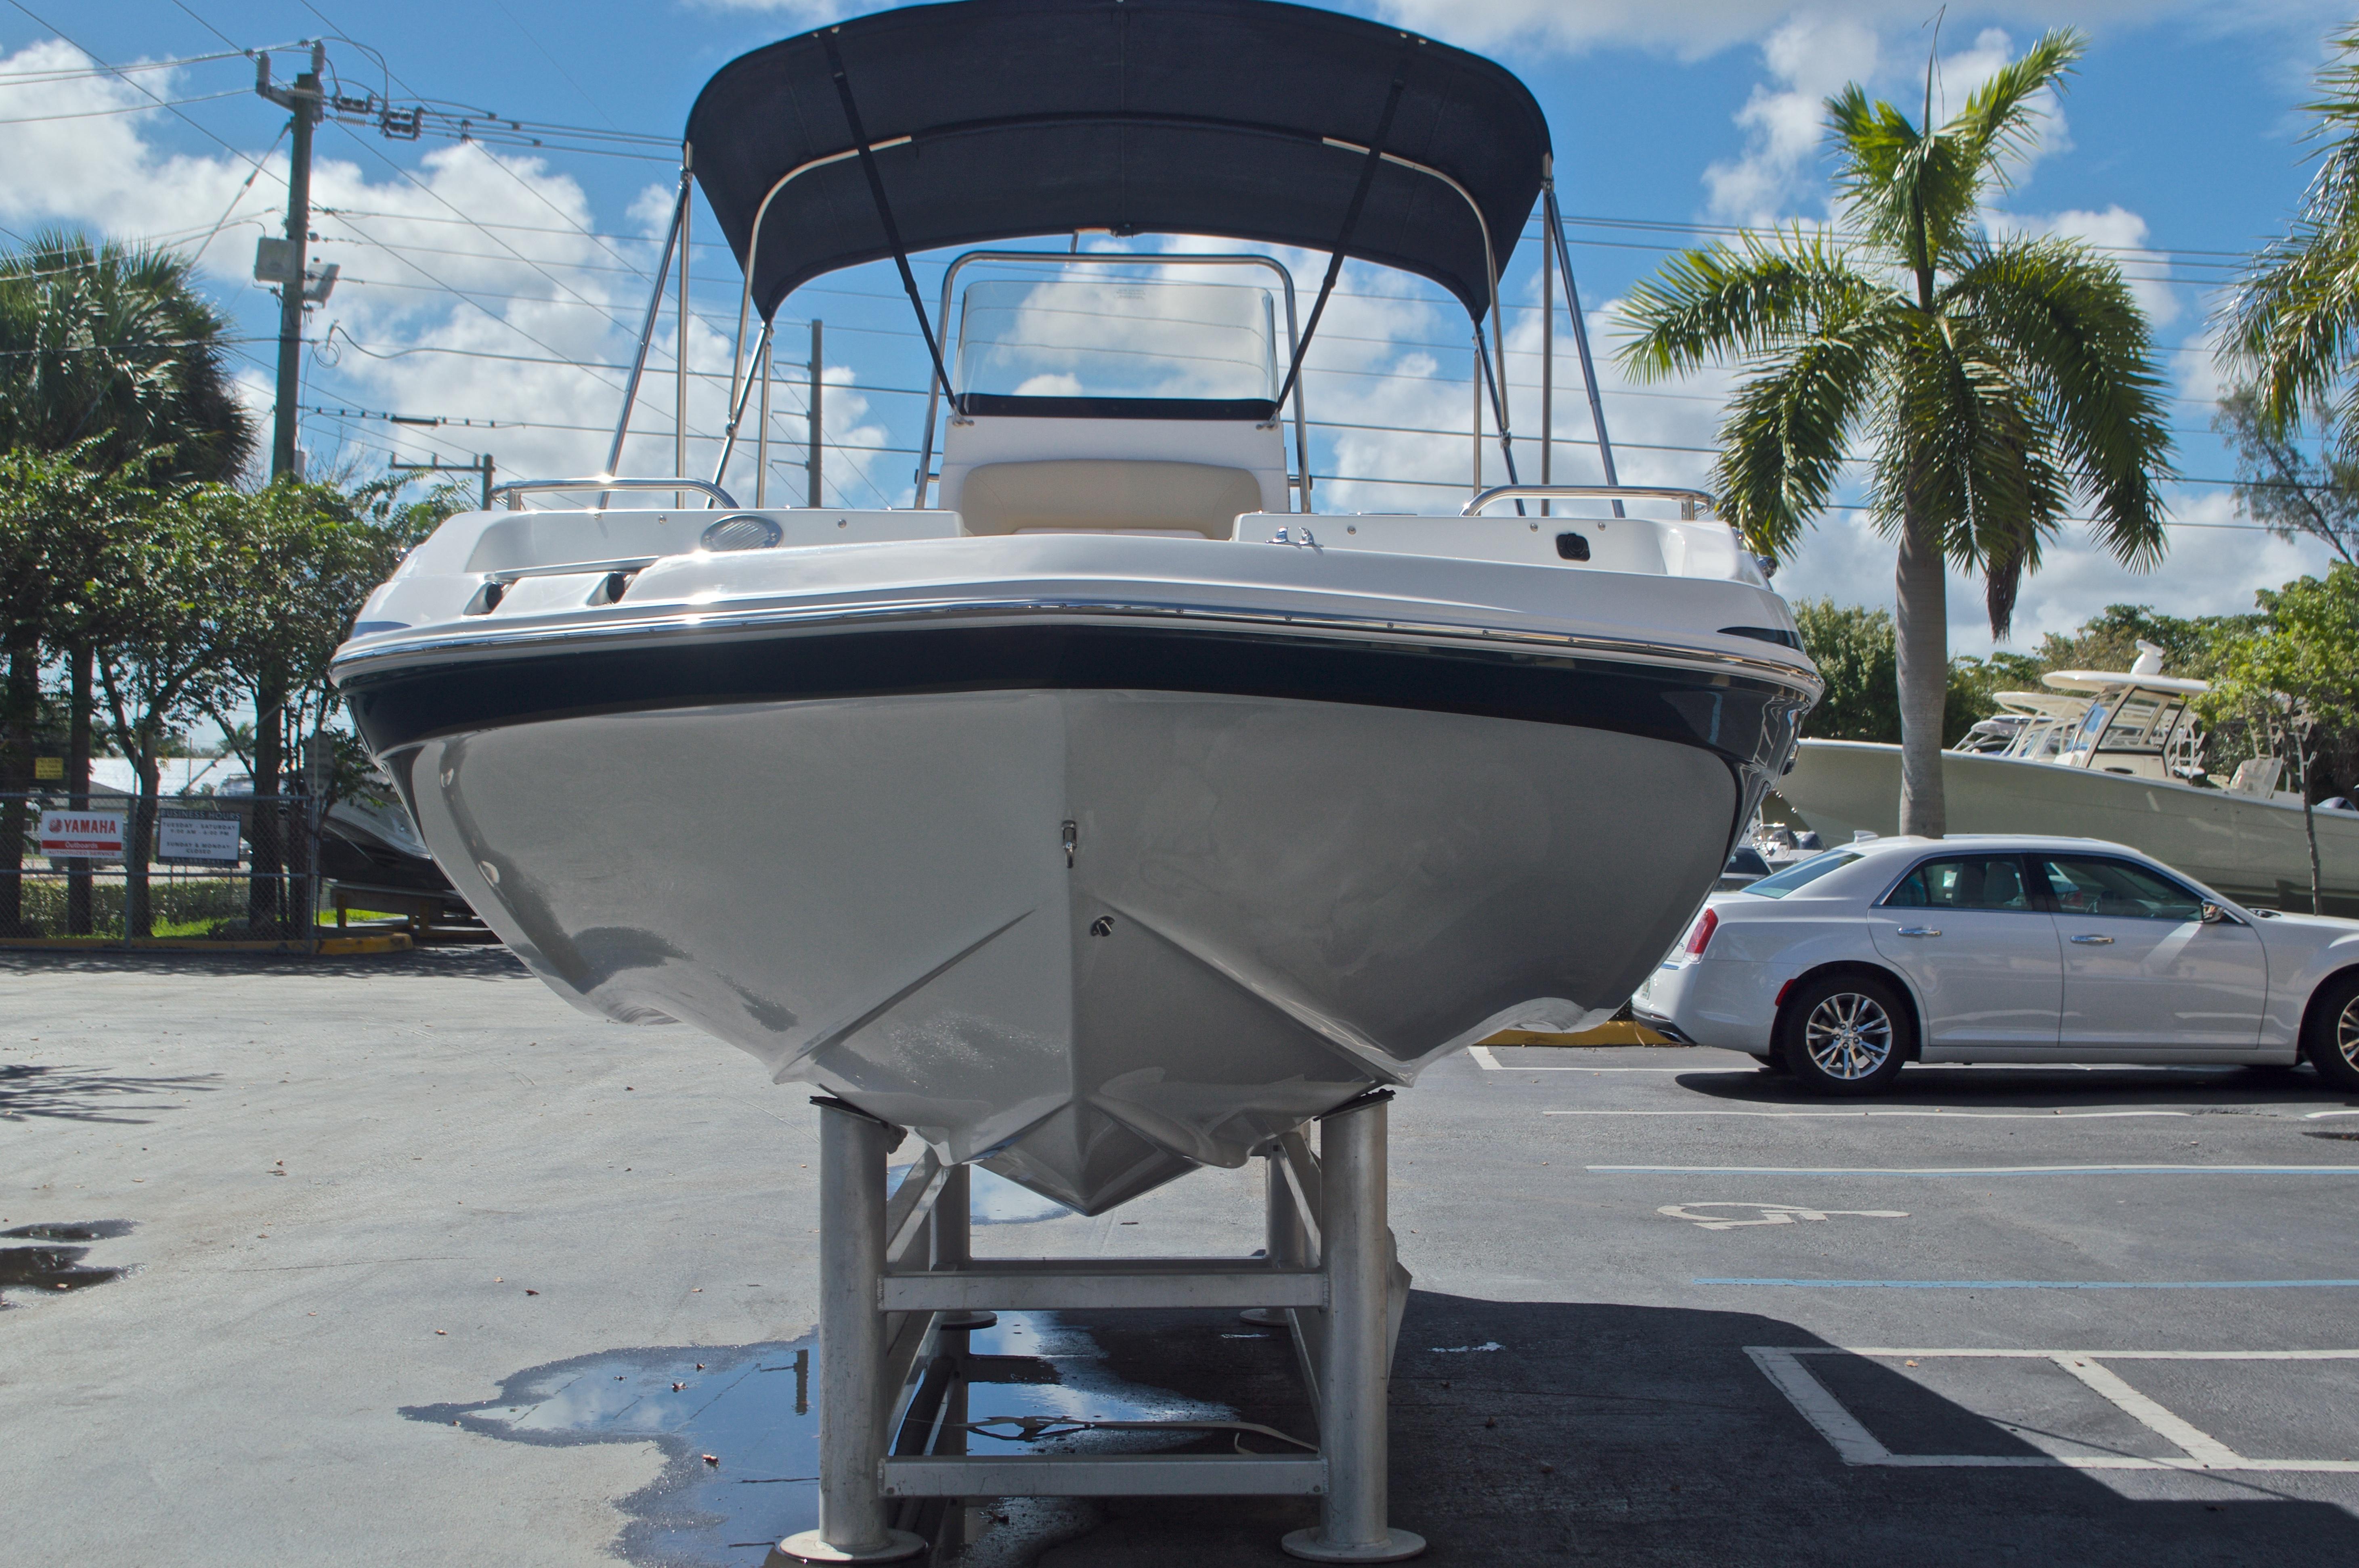 Thumbnail 2 for New 2017 Hurricane CC21 Center Console boat for sale in Vero Beach, FL